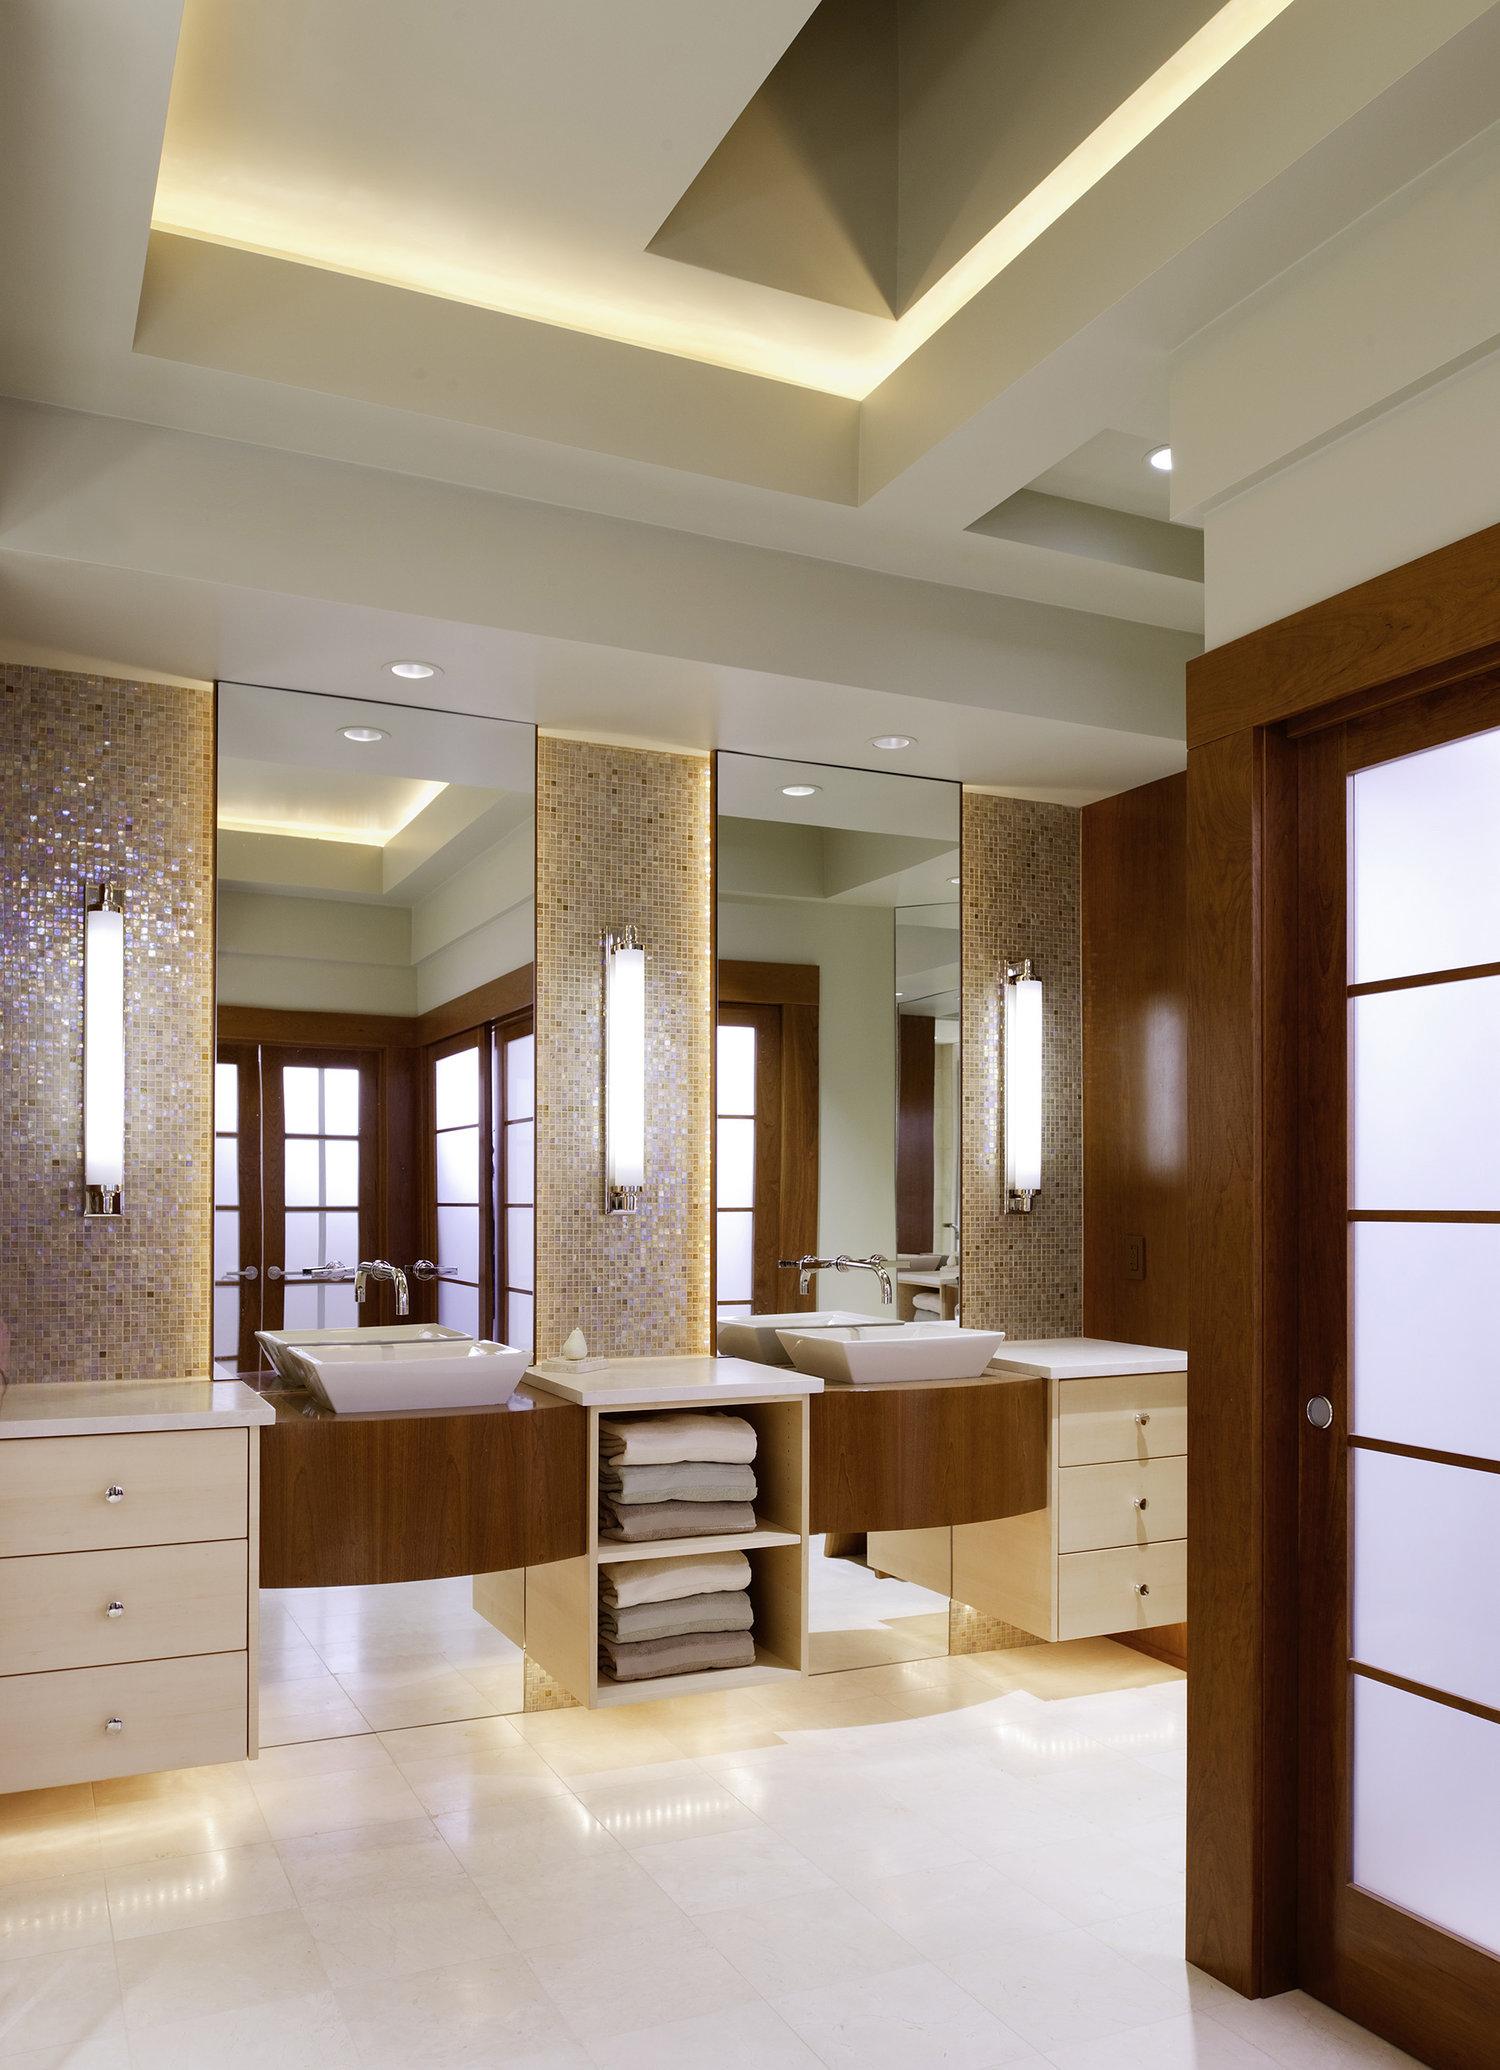 kitchen_bath_concepts_wholehome5_4.jpg